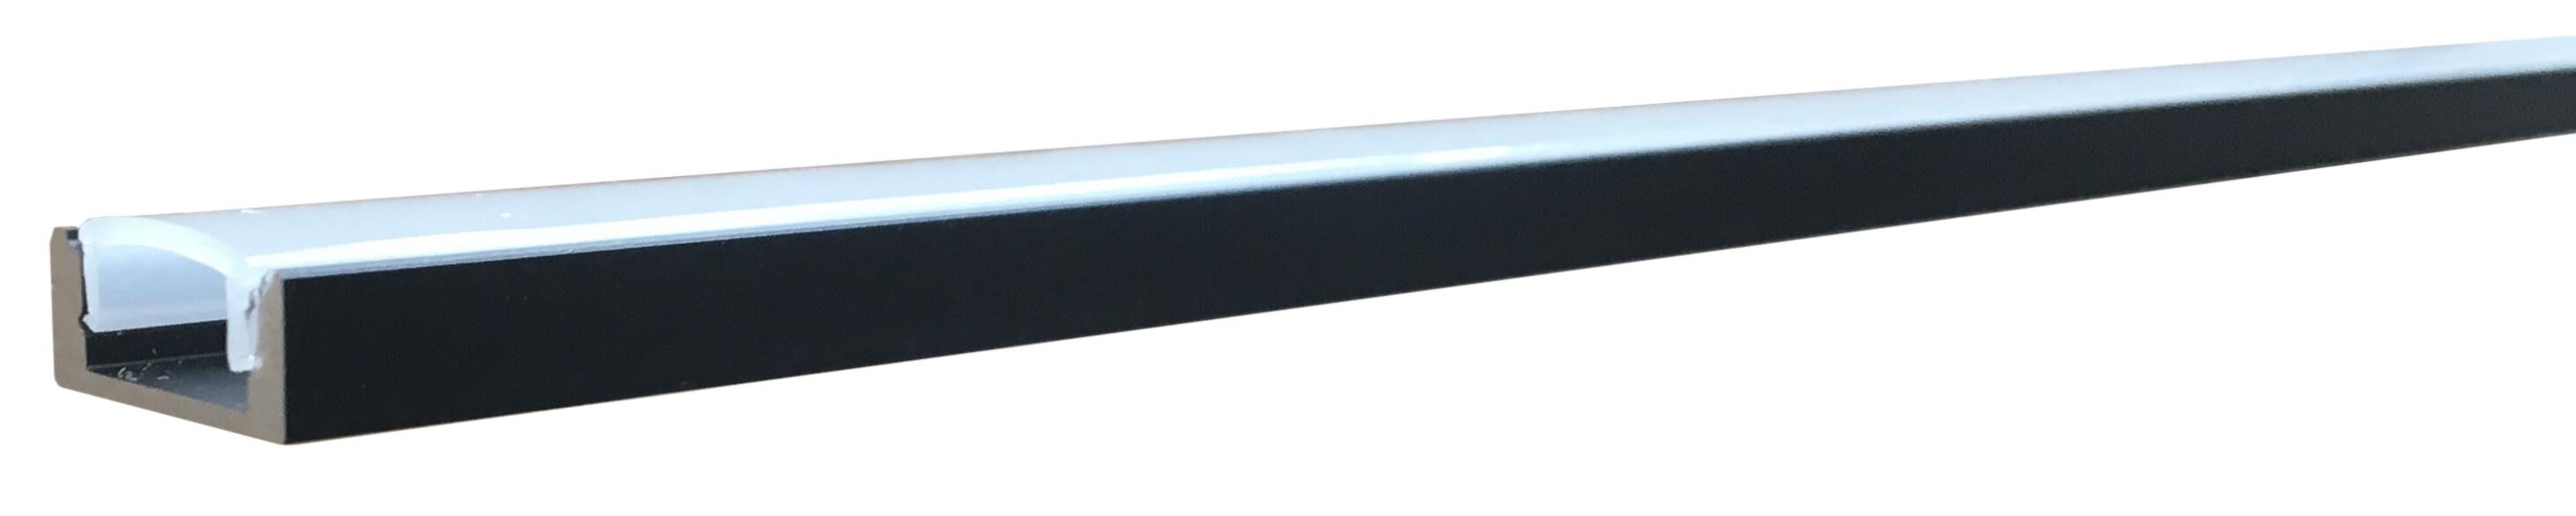 Integratech alu swiss aluminium led strip profiel accessoires